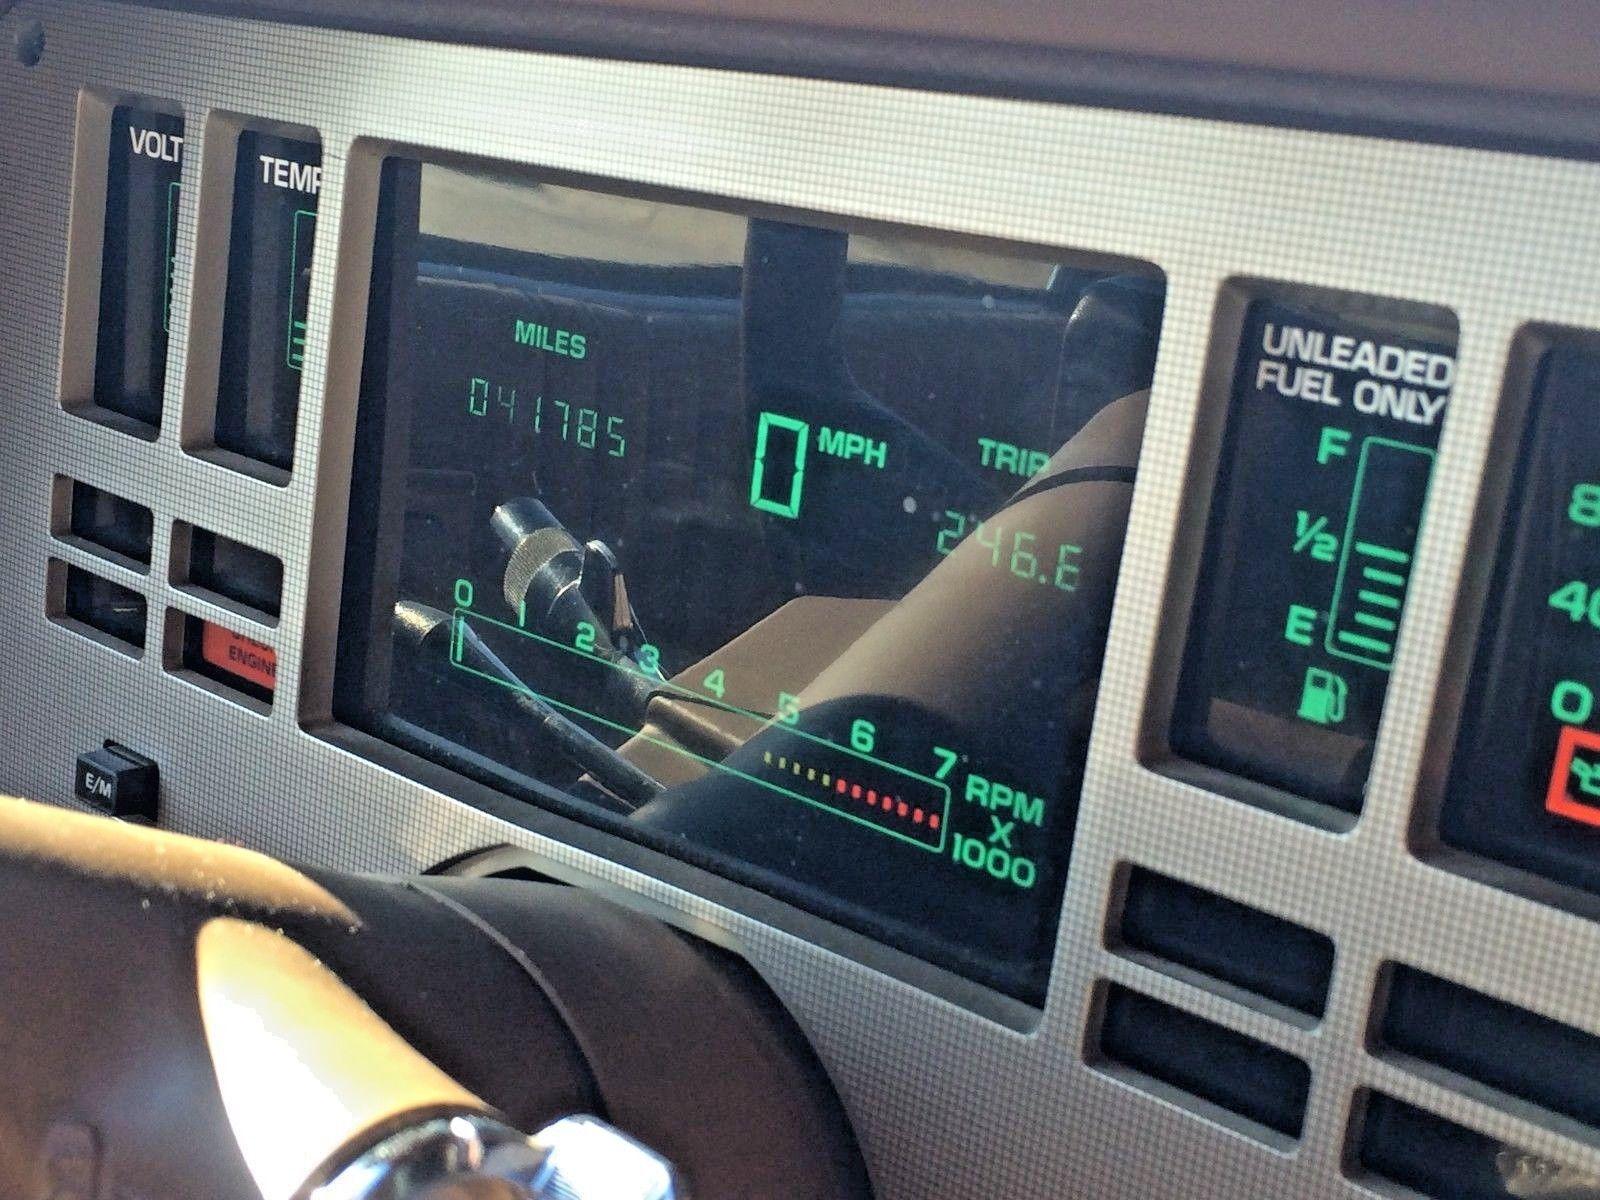 1985 Cadillac Cimarron instrument panel